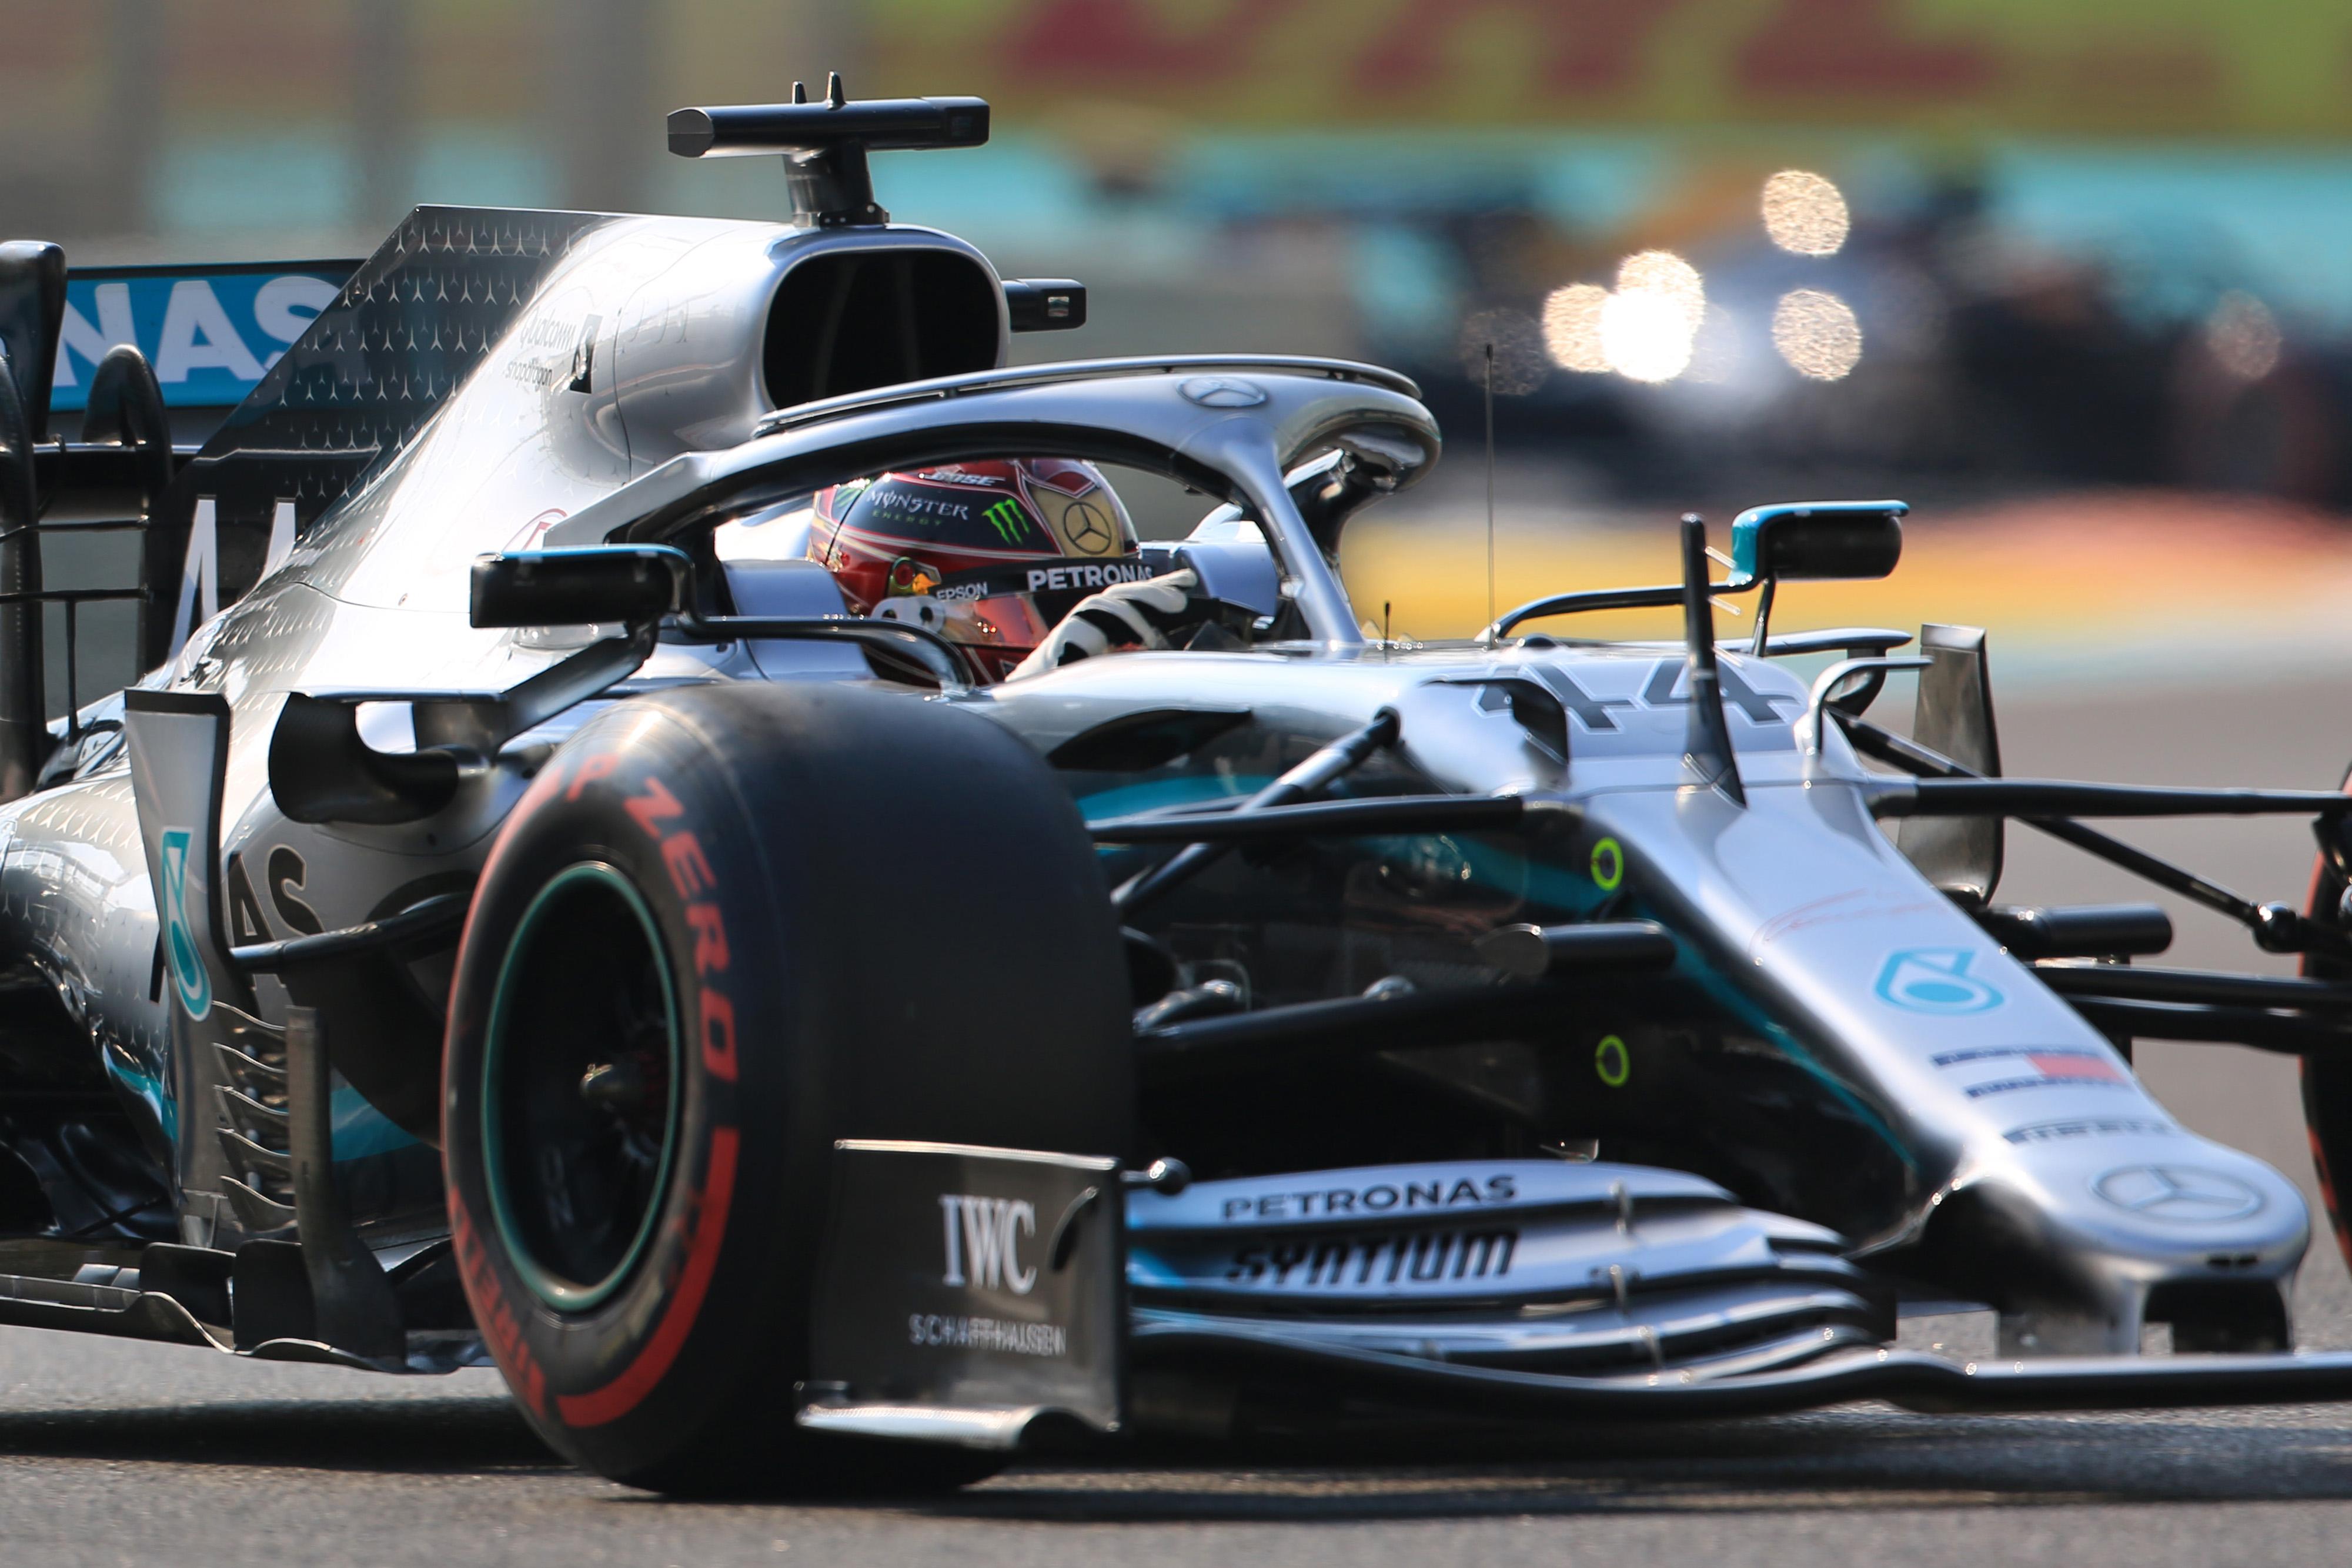 F1 Formula 1 Lewis Hamilton Mercedes Toto Wolff INEOS